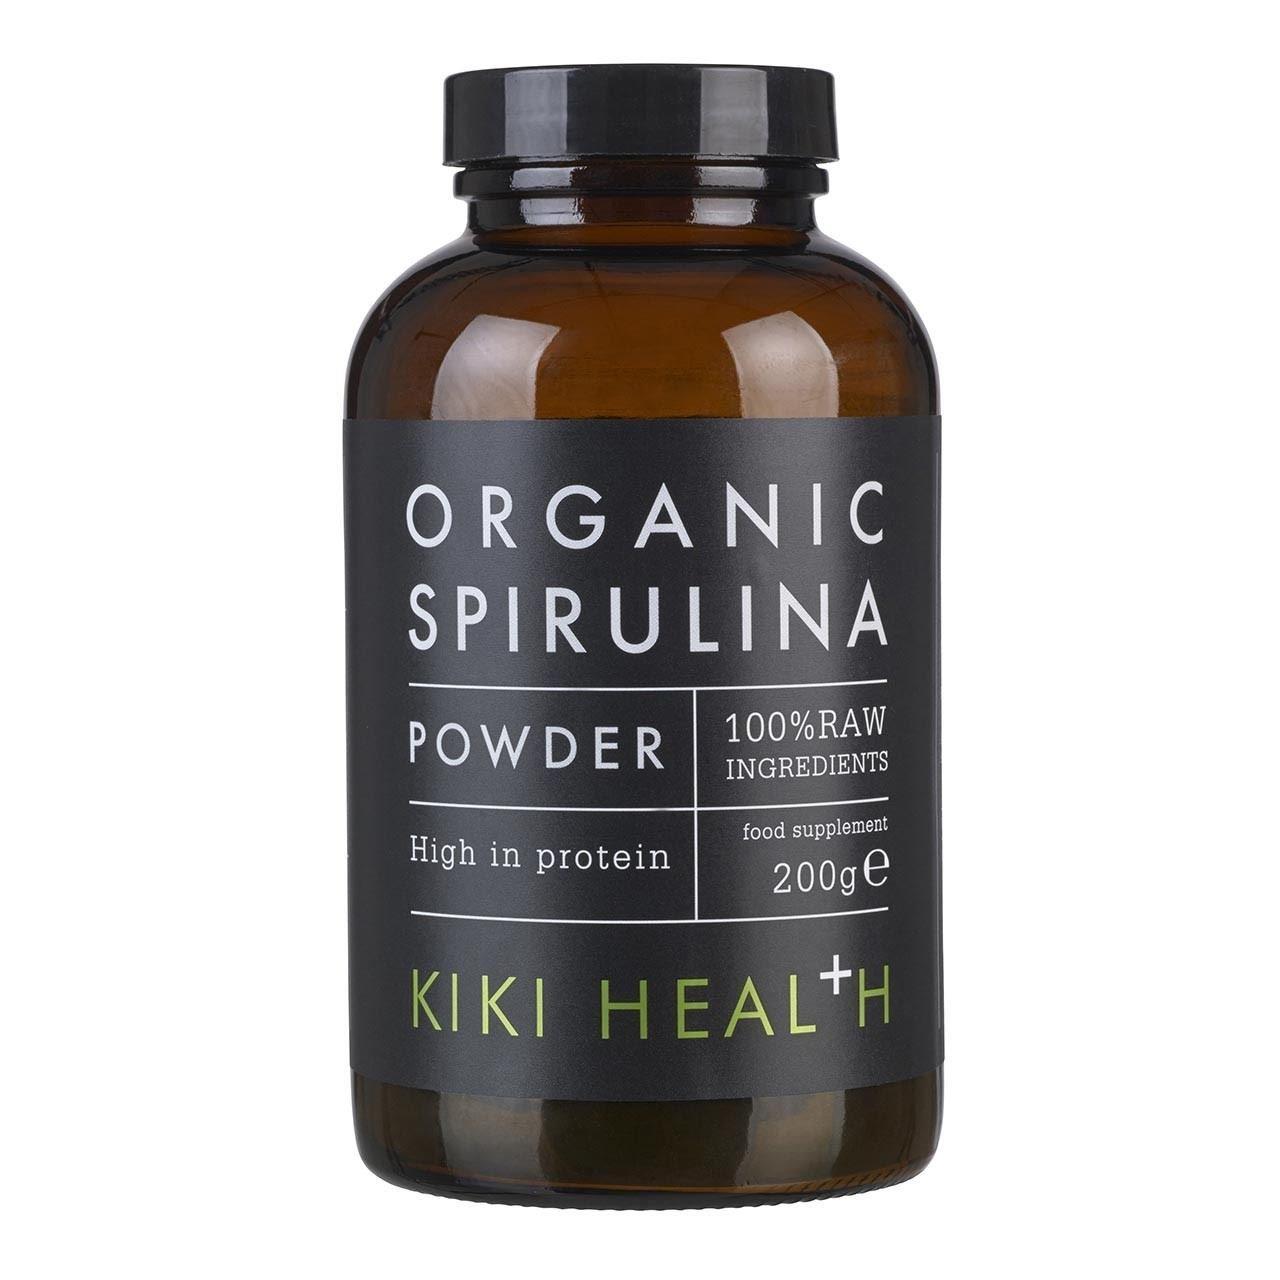 (3 PACK) - Kiki Organic Spirulina Powder | 200g | 3 PACK - SUPER SAVER - SAVE MONEY